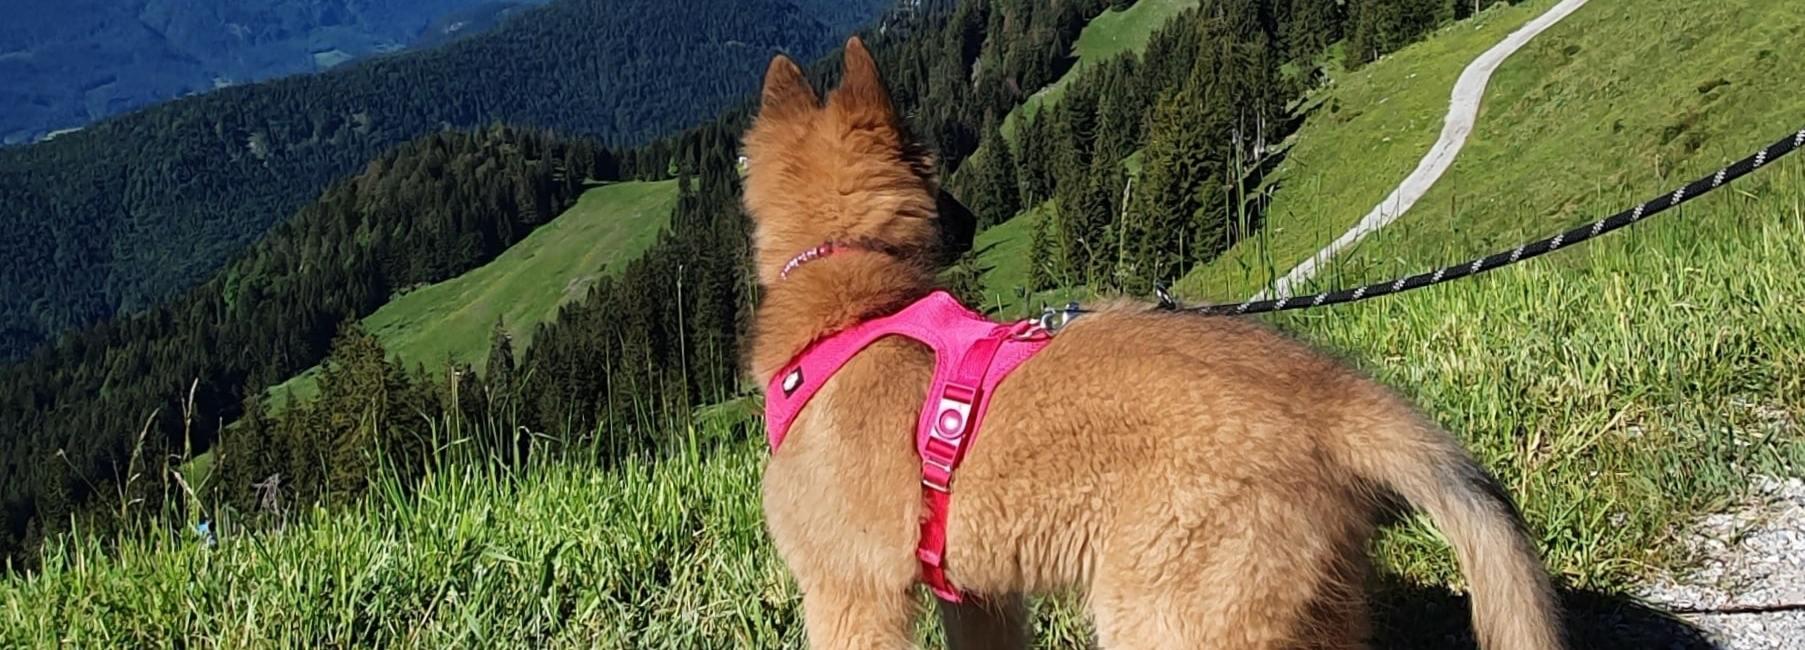 ferien corona ausflugstipps kinder hund oberbayern